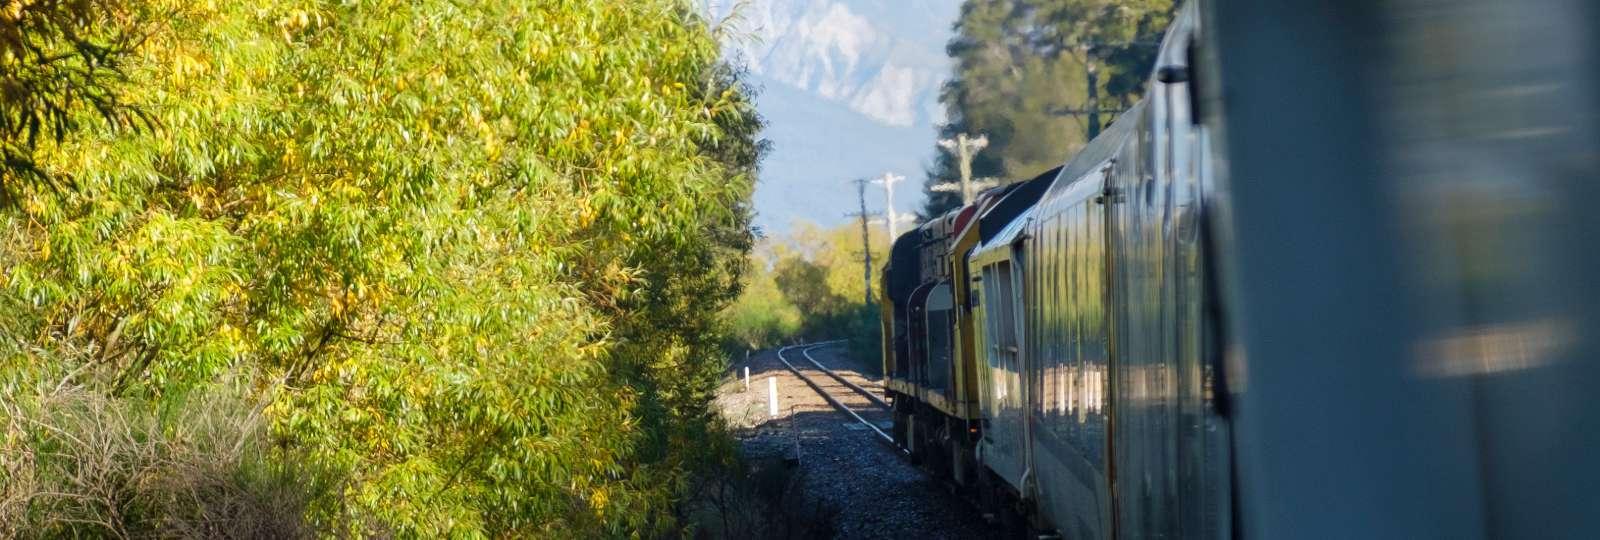 TranaAlphine Train